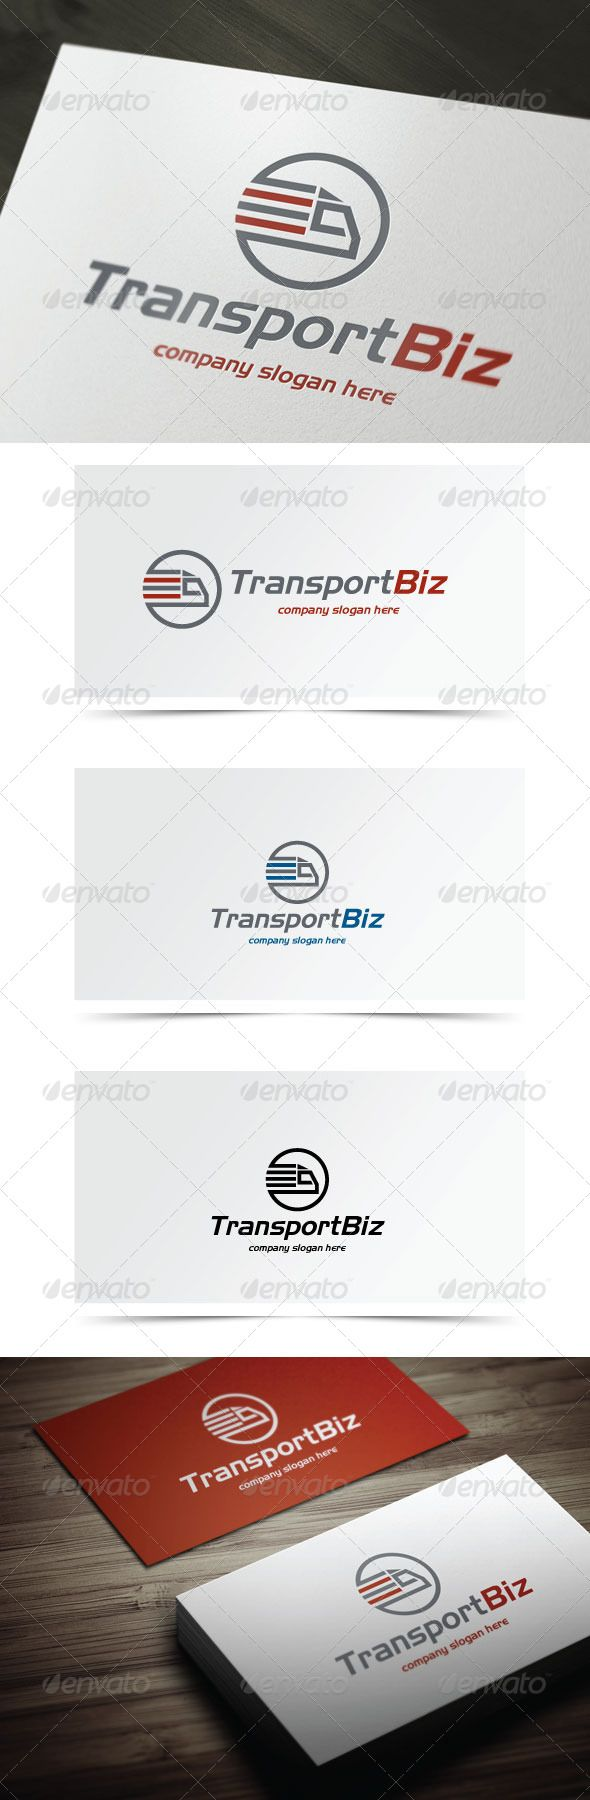 Transport Biz - Logo Design Template Vector #logotype Download it here: http://graphicriver.net/item/transport-biz/6123960?s_rank=353?ref=nesto